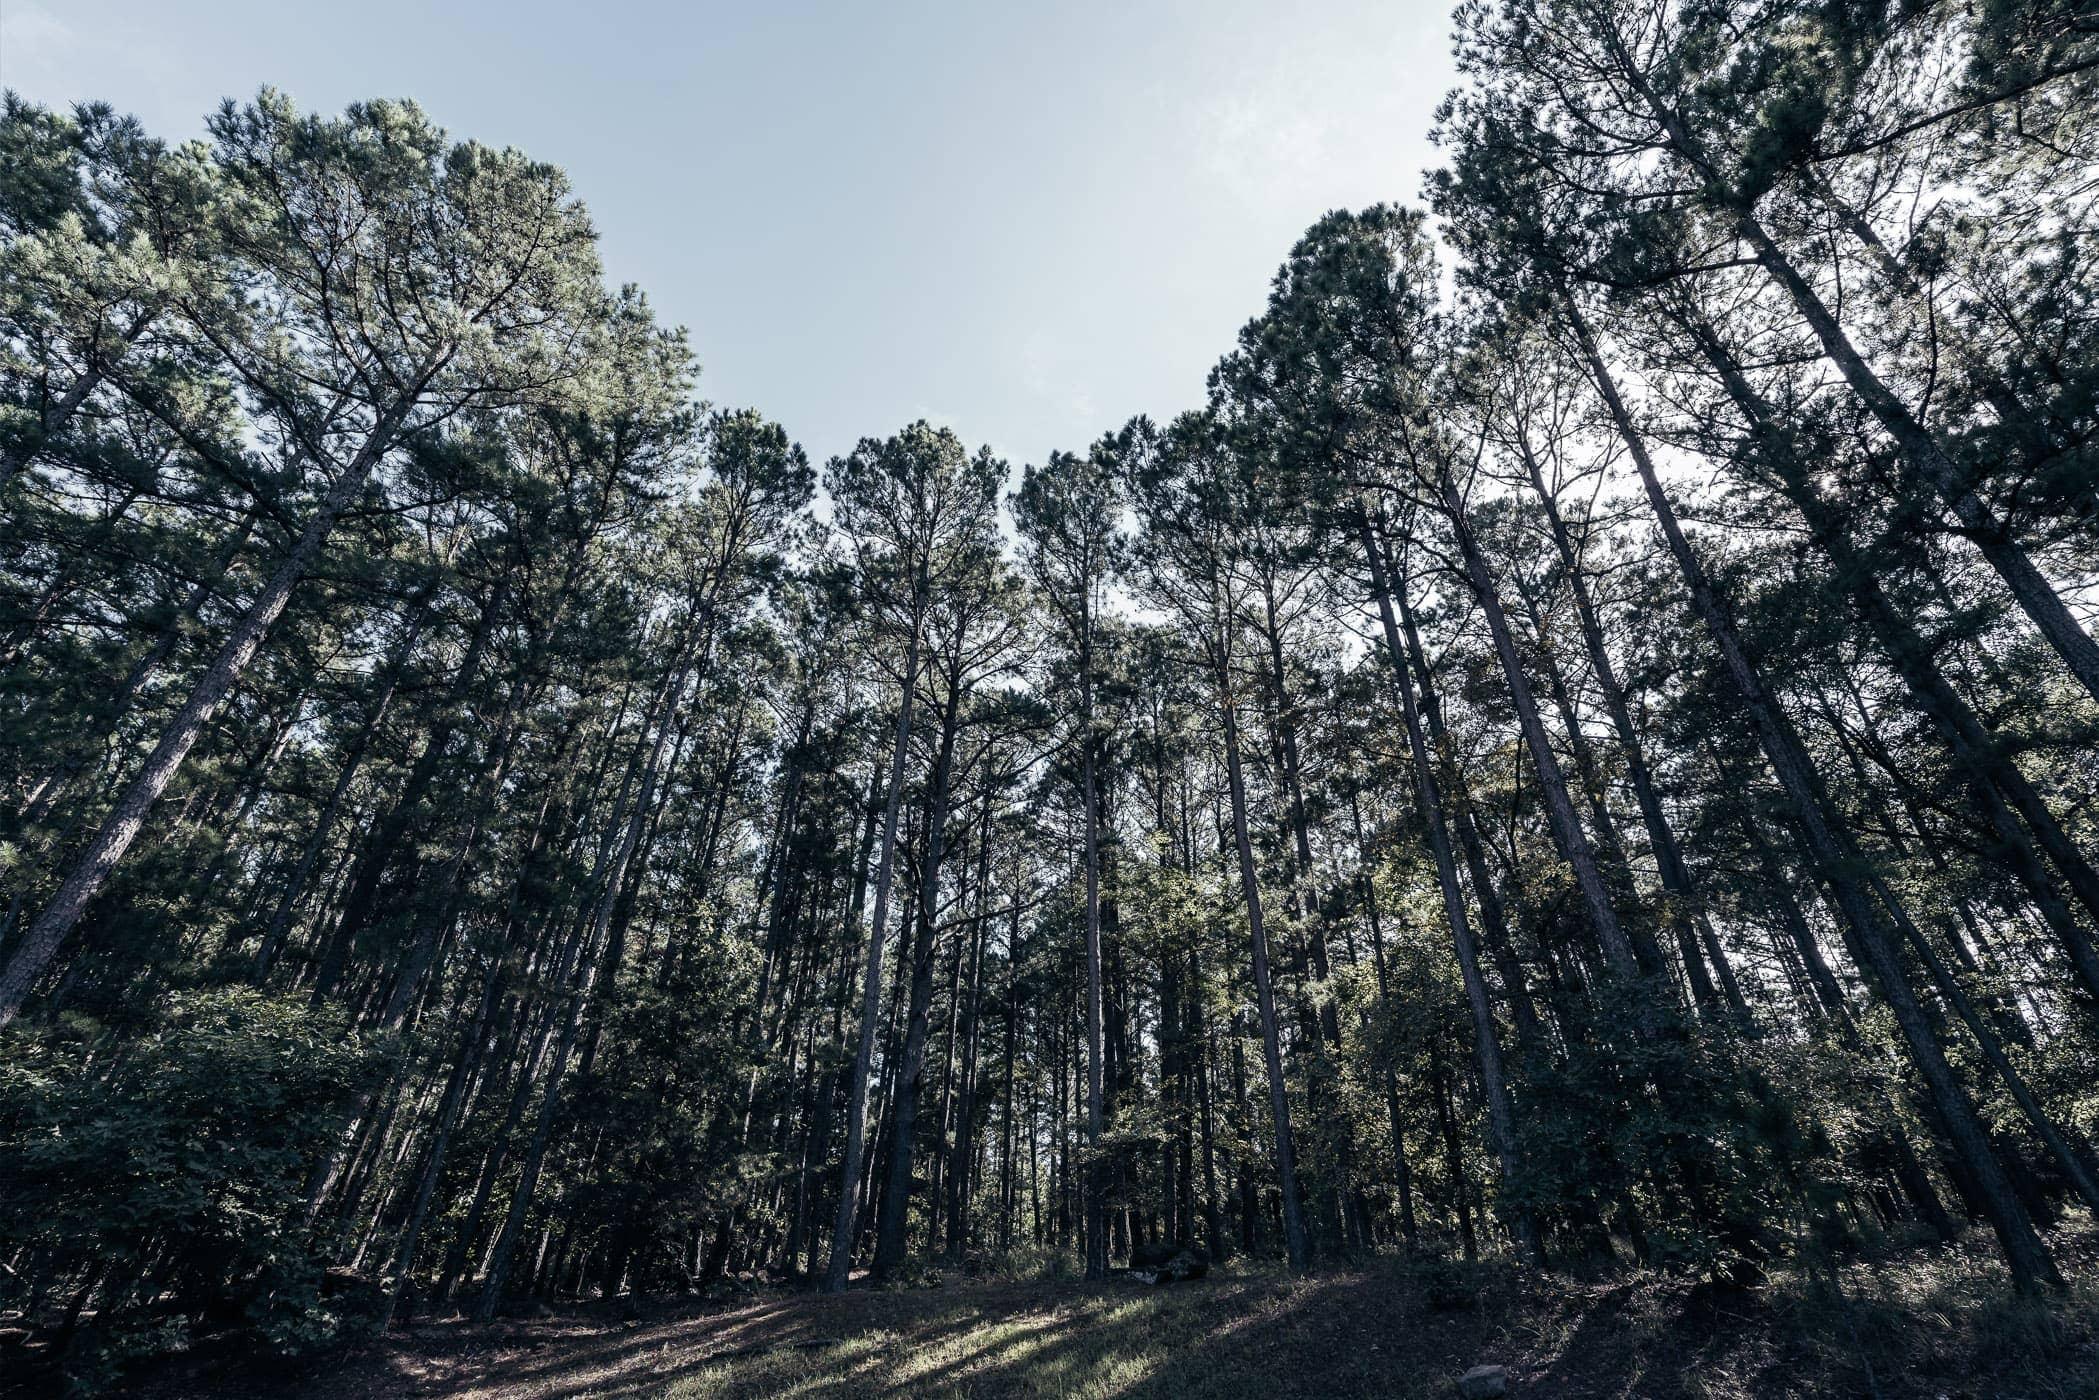 Pine trees grow tall at Oklahoma's McGee Creek State Park.